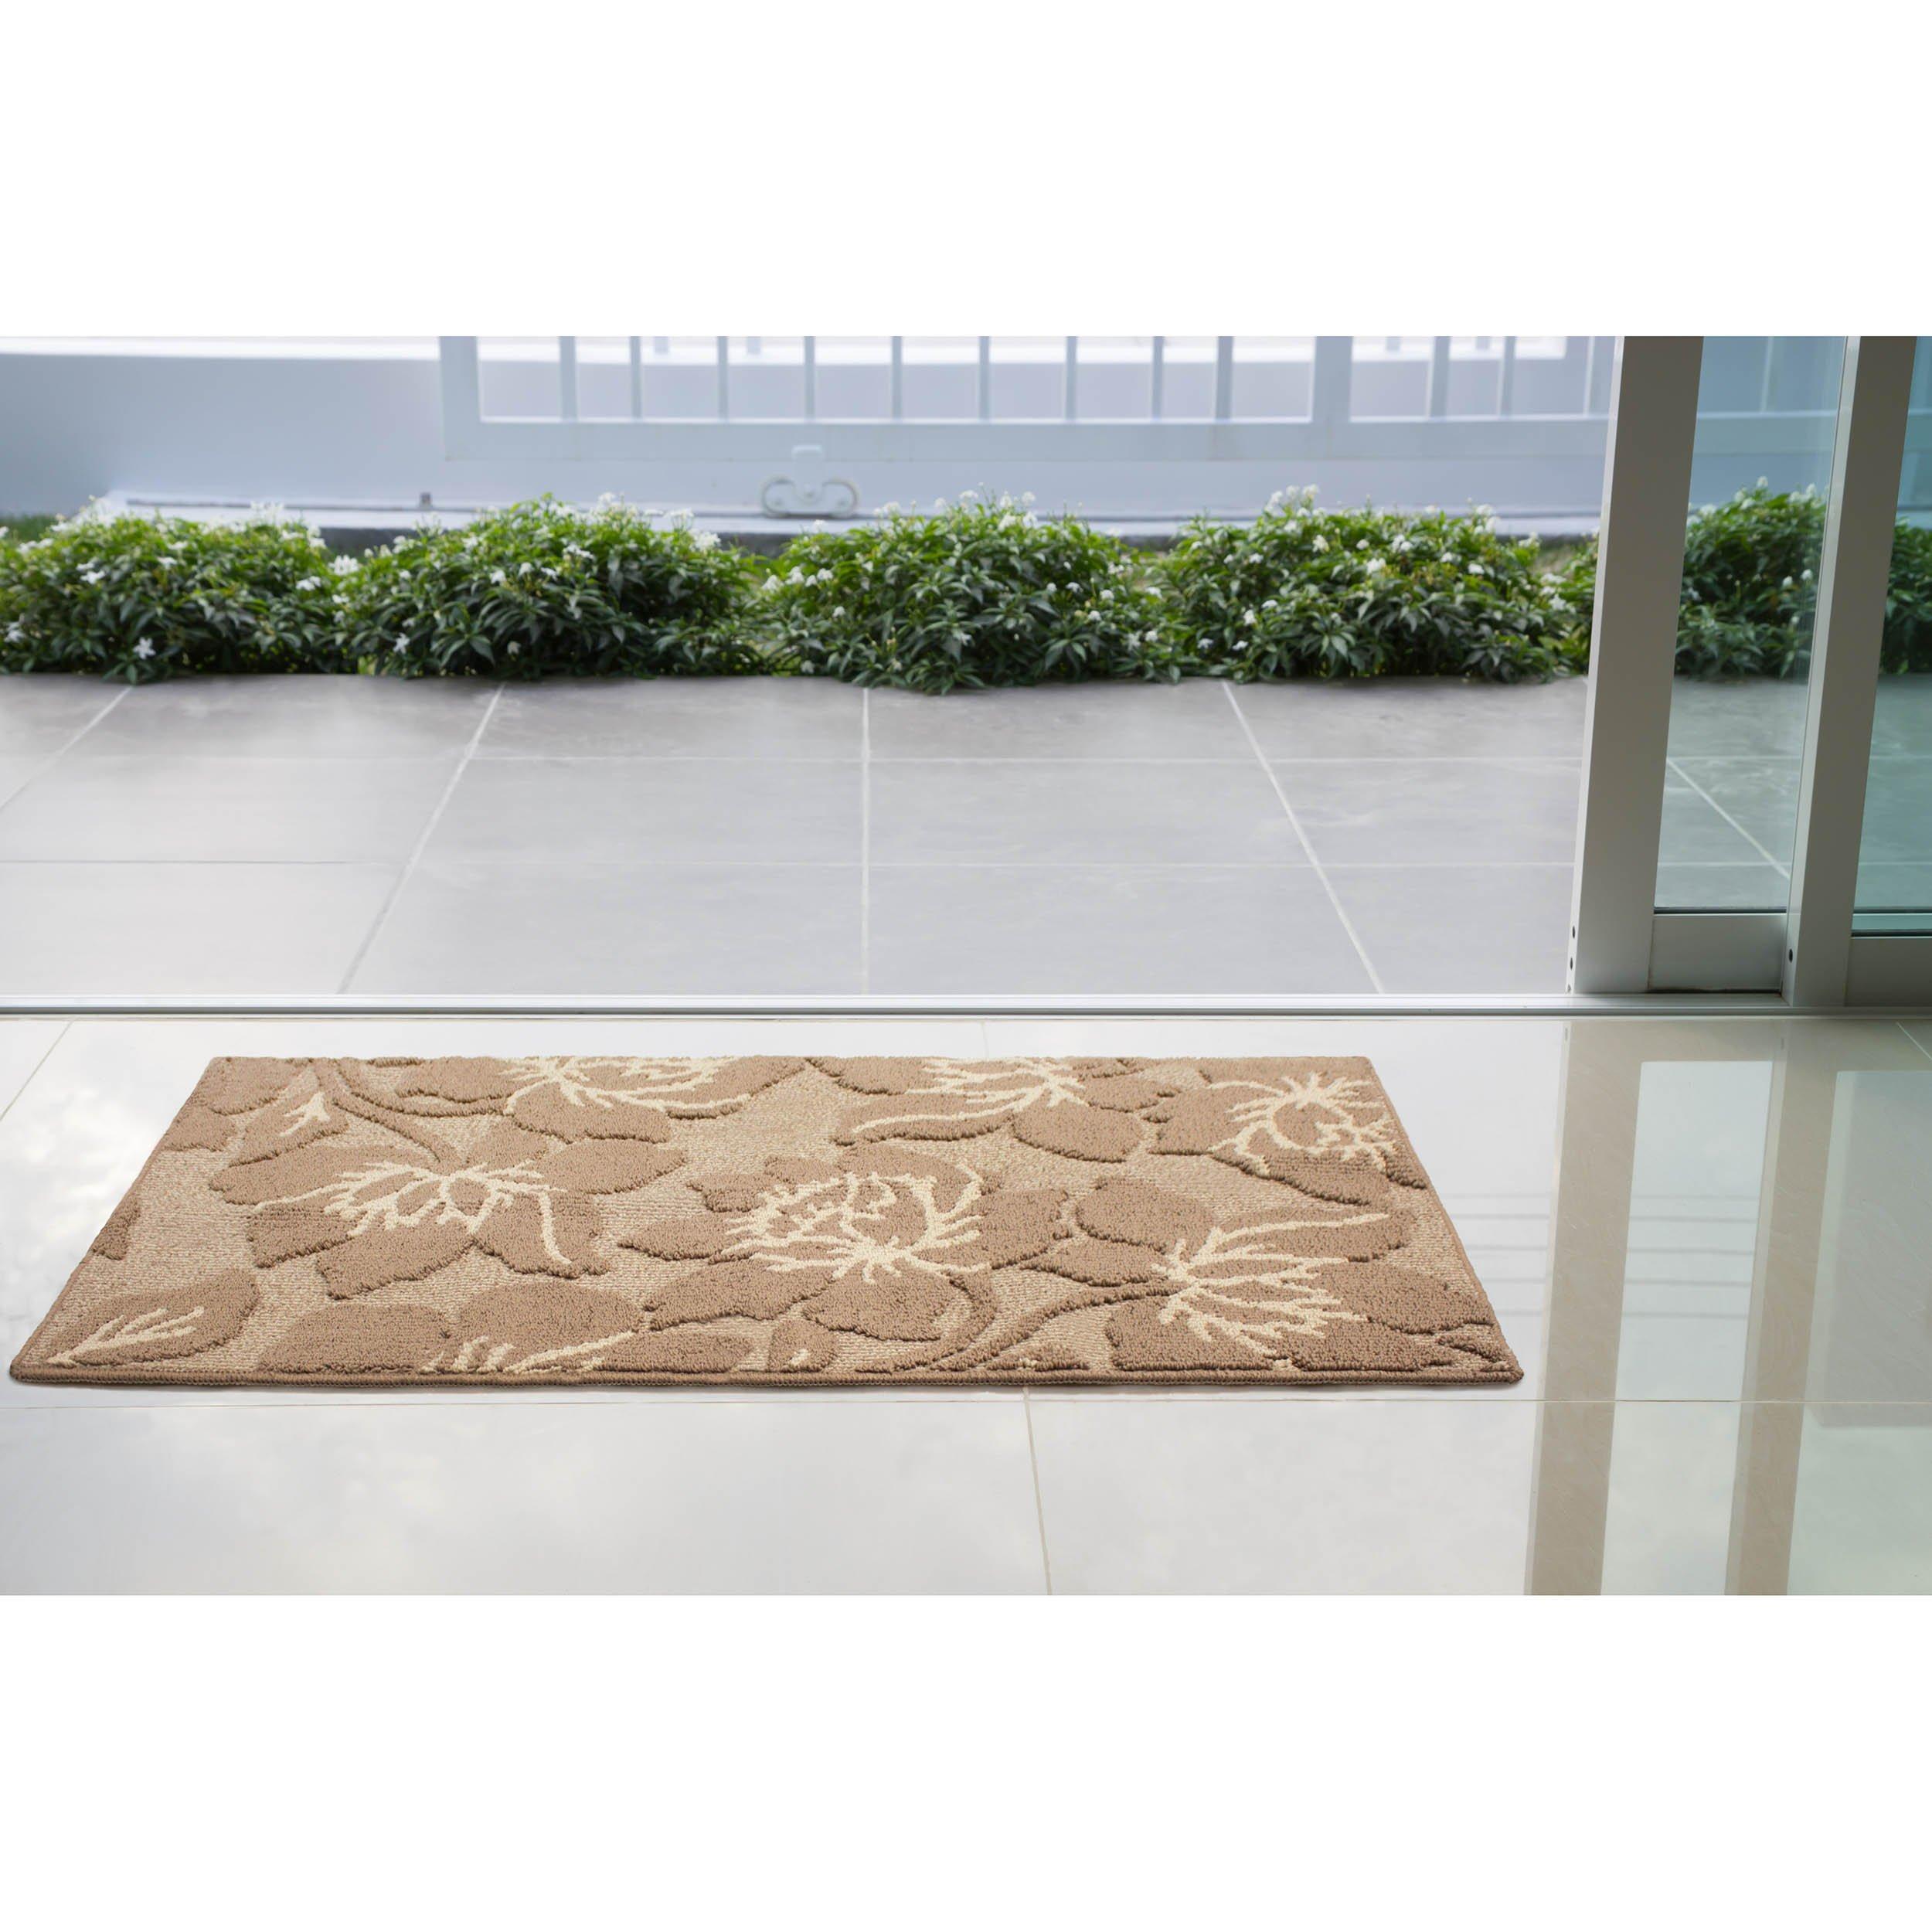 Jean Pierre All Loop Kimmy 24 x 60 in. Decorative Textured Accent Rug, Linen/Berber